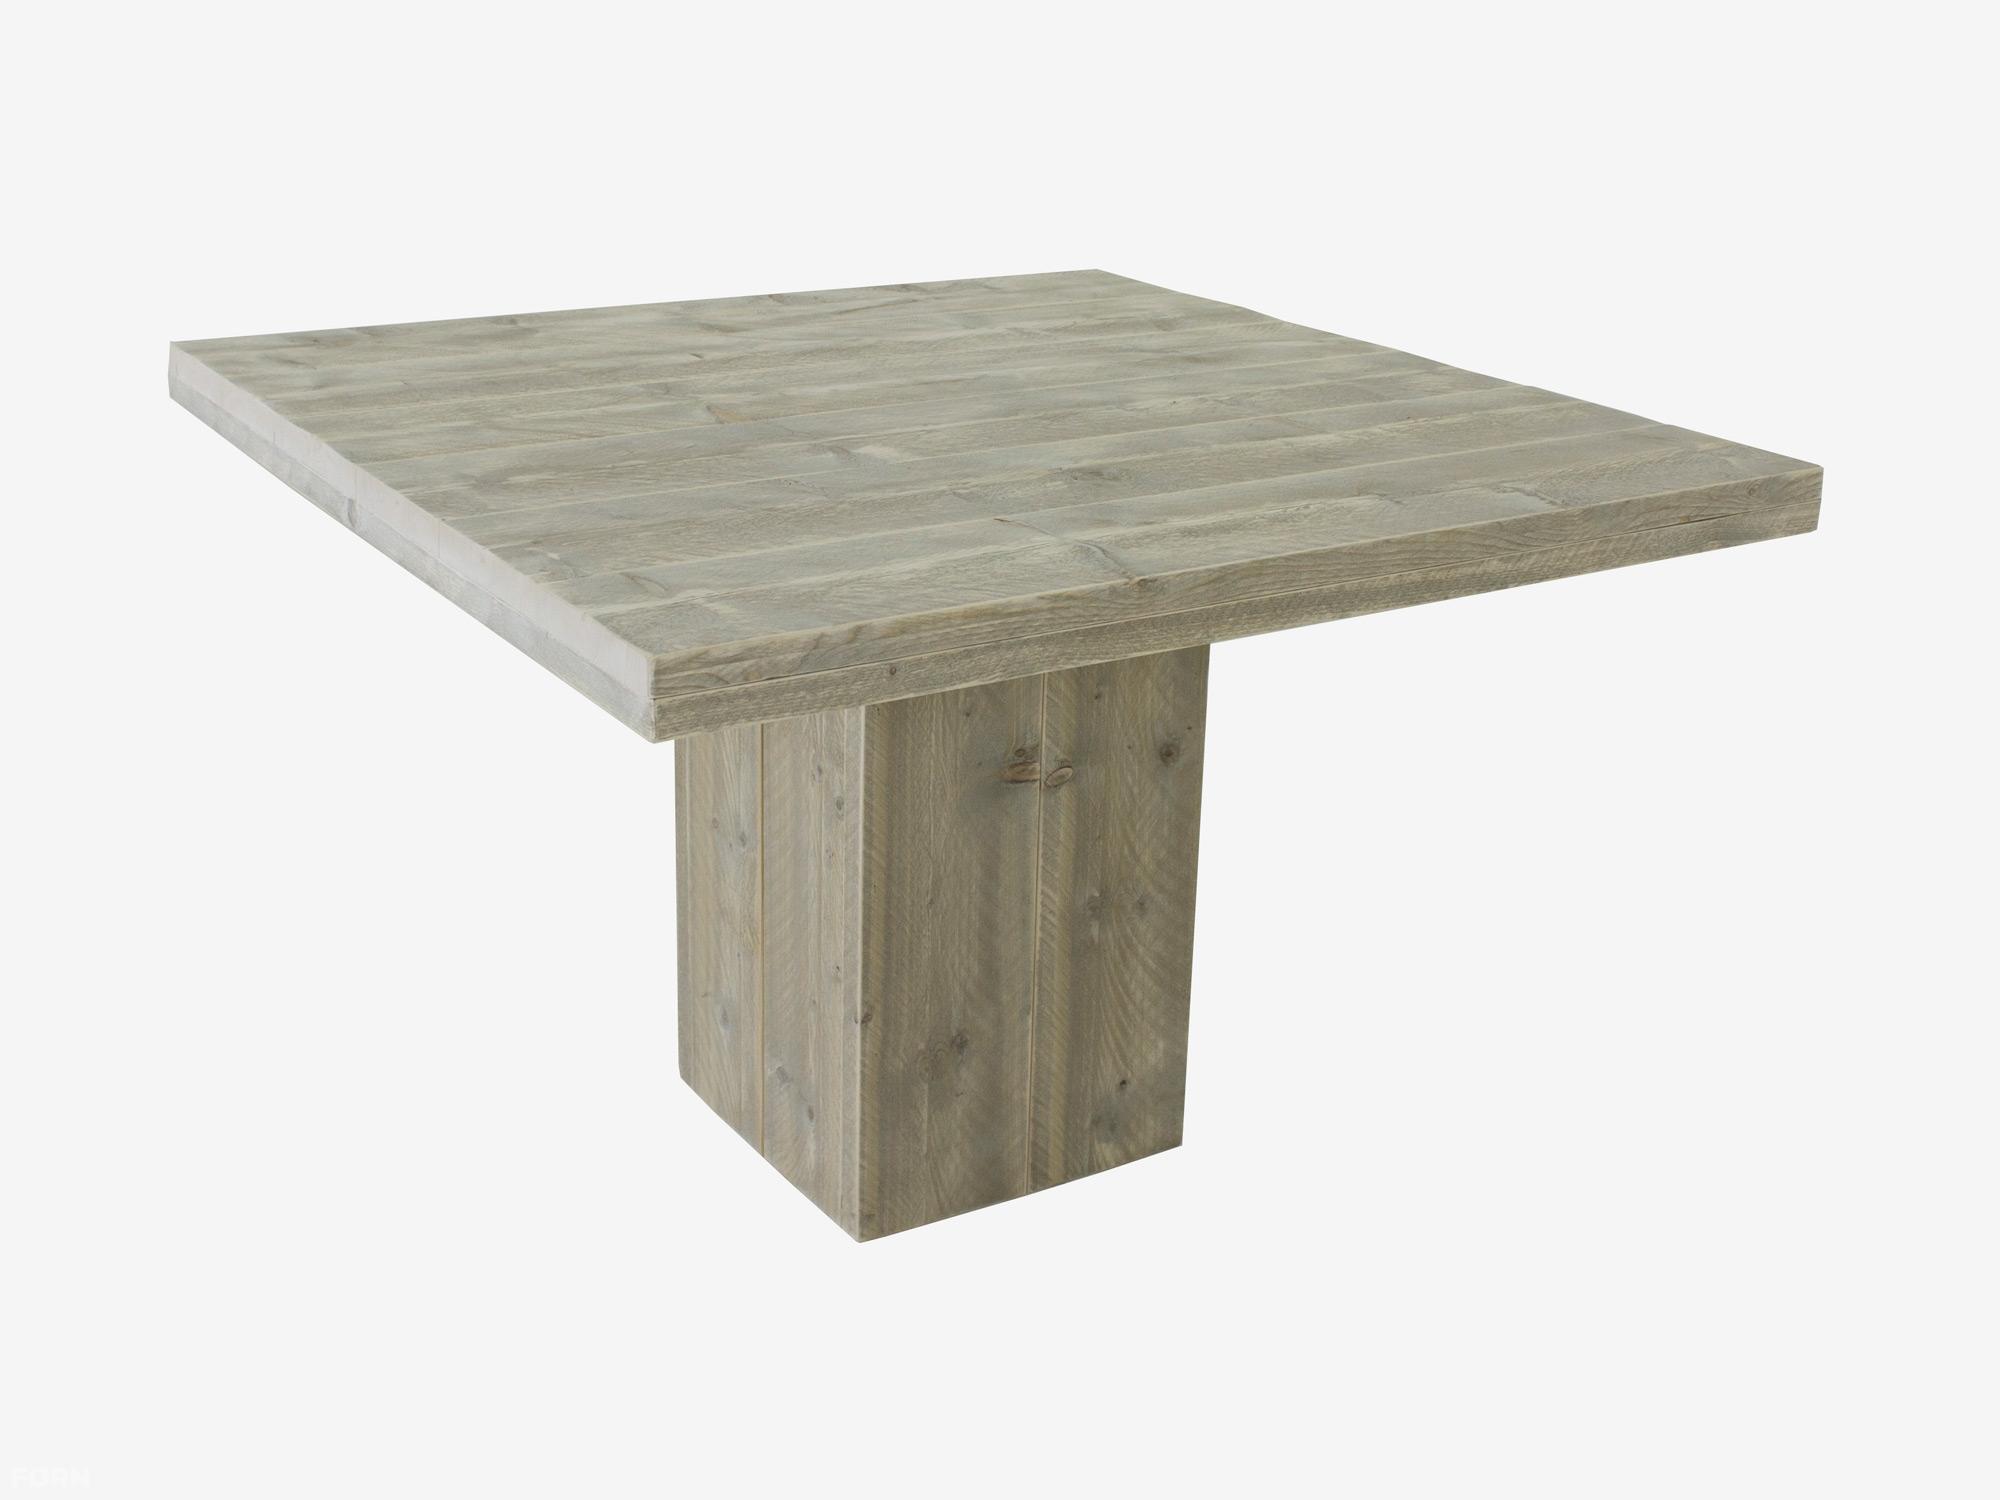 Steigerhouten tafel met kolompoot ook maatwerk f rn for Steigerhouten eettafel maken